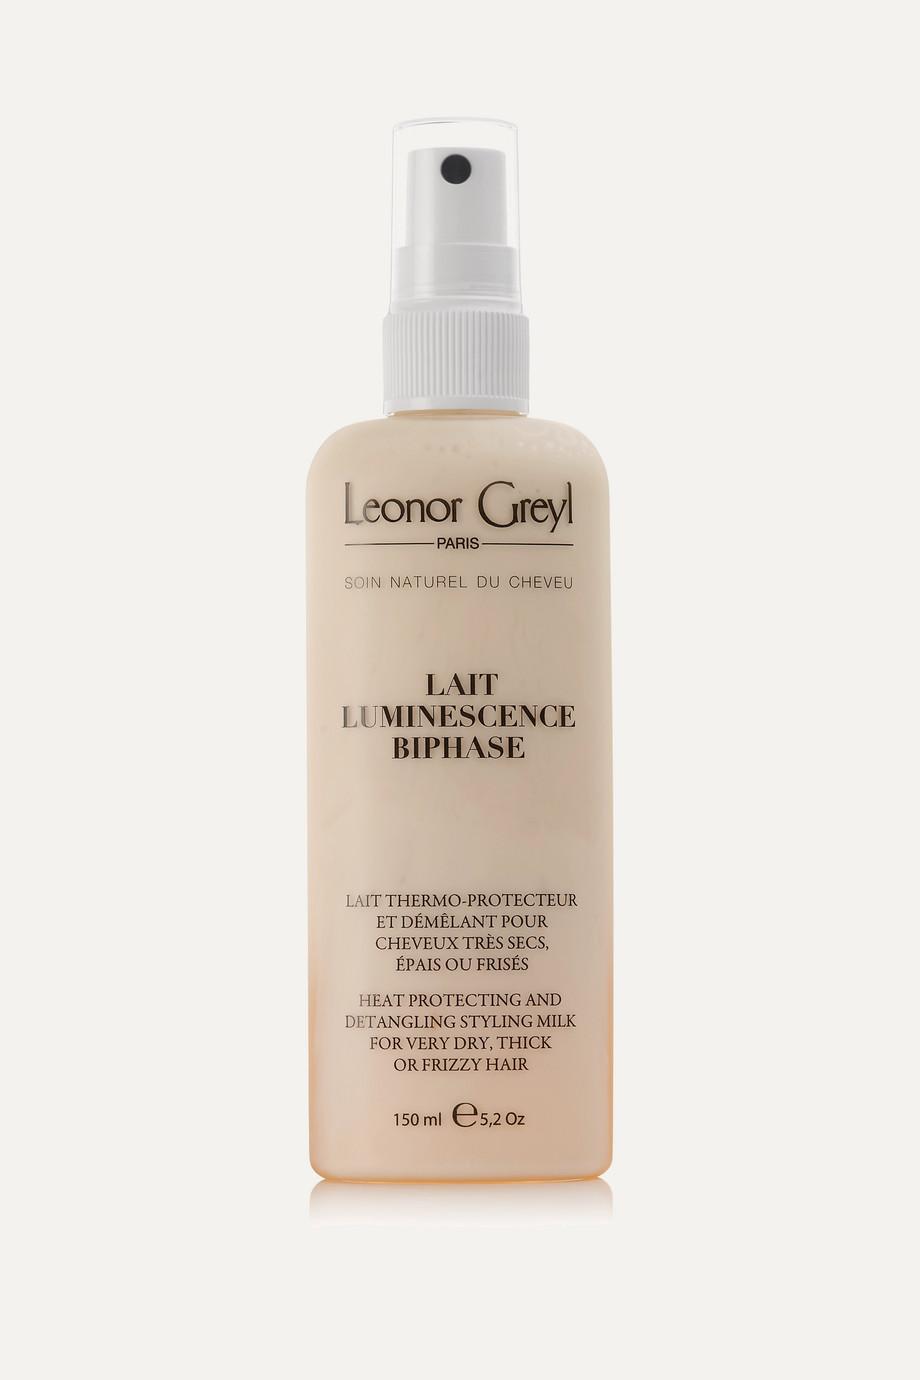 Leonor Greyl Paris Lait Luminescence Bi-Phase Detangling Styling Milk, 150ml